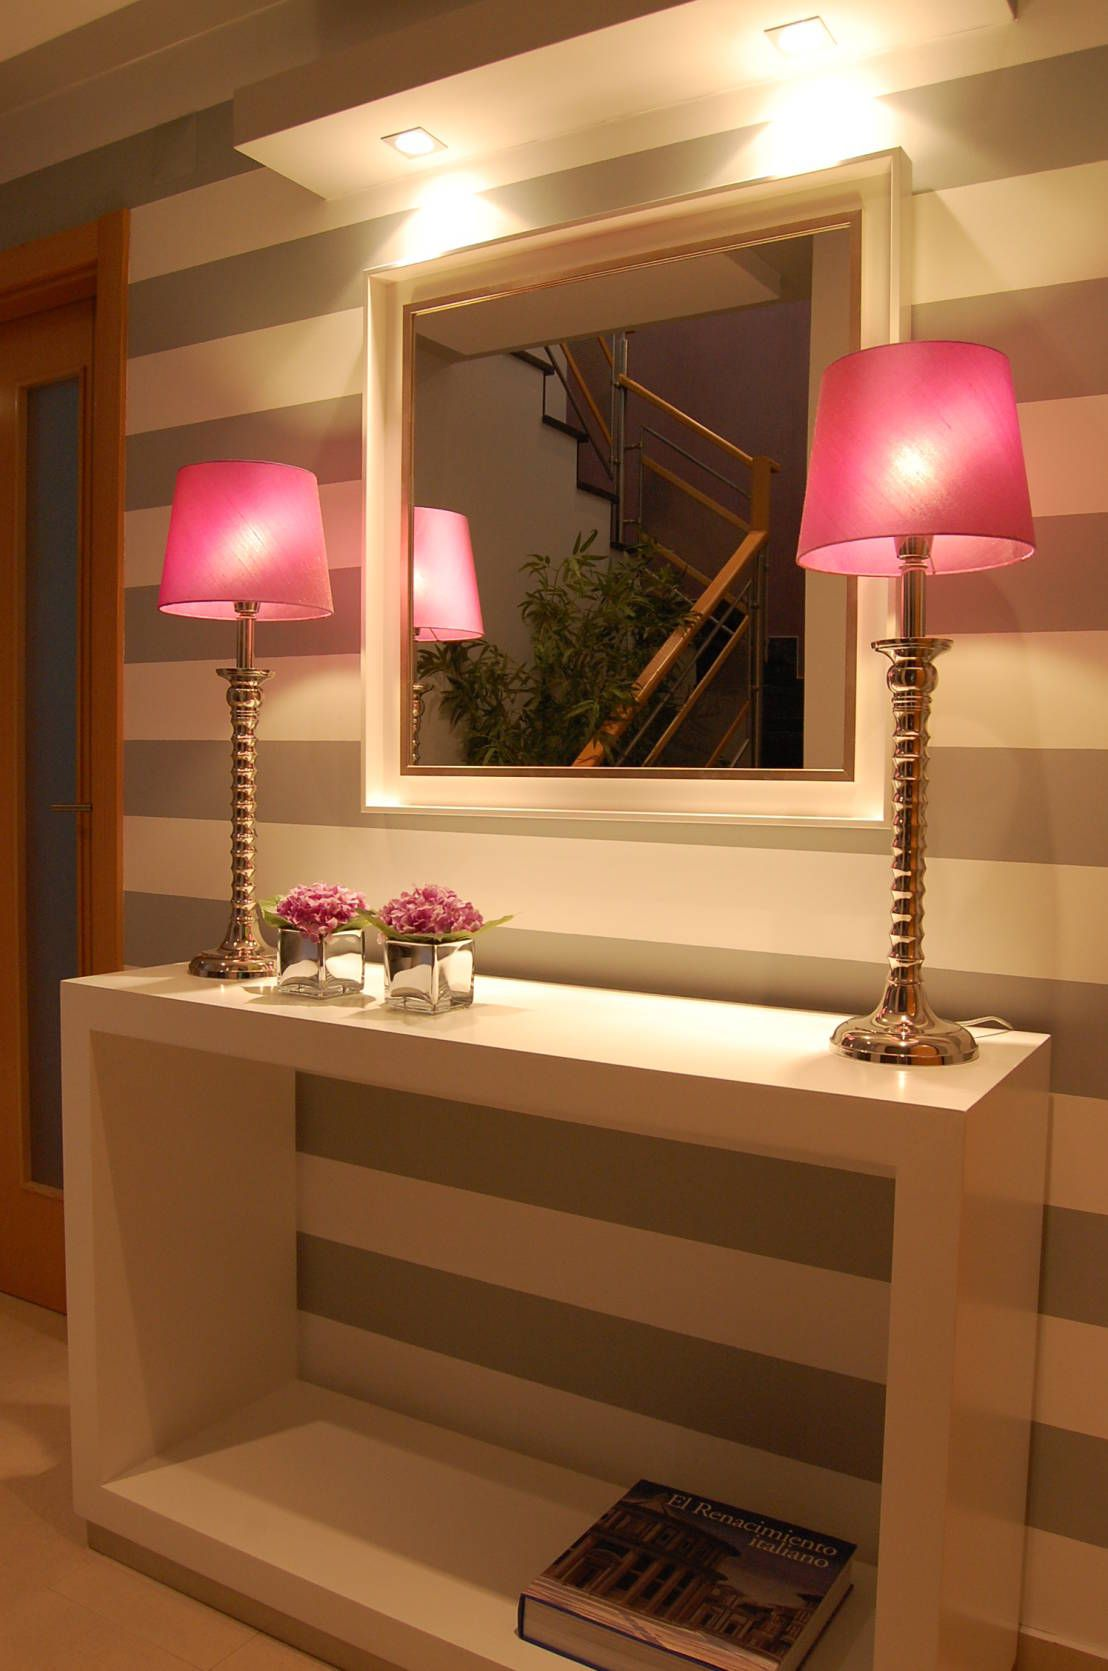 Entry hallway furniture   ideas para decorar casas modernas  Entry hallway Future house